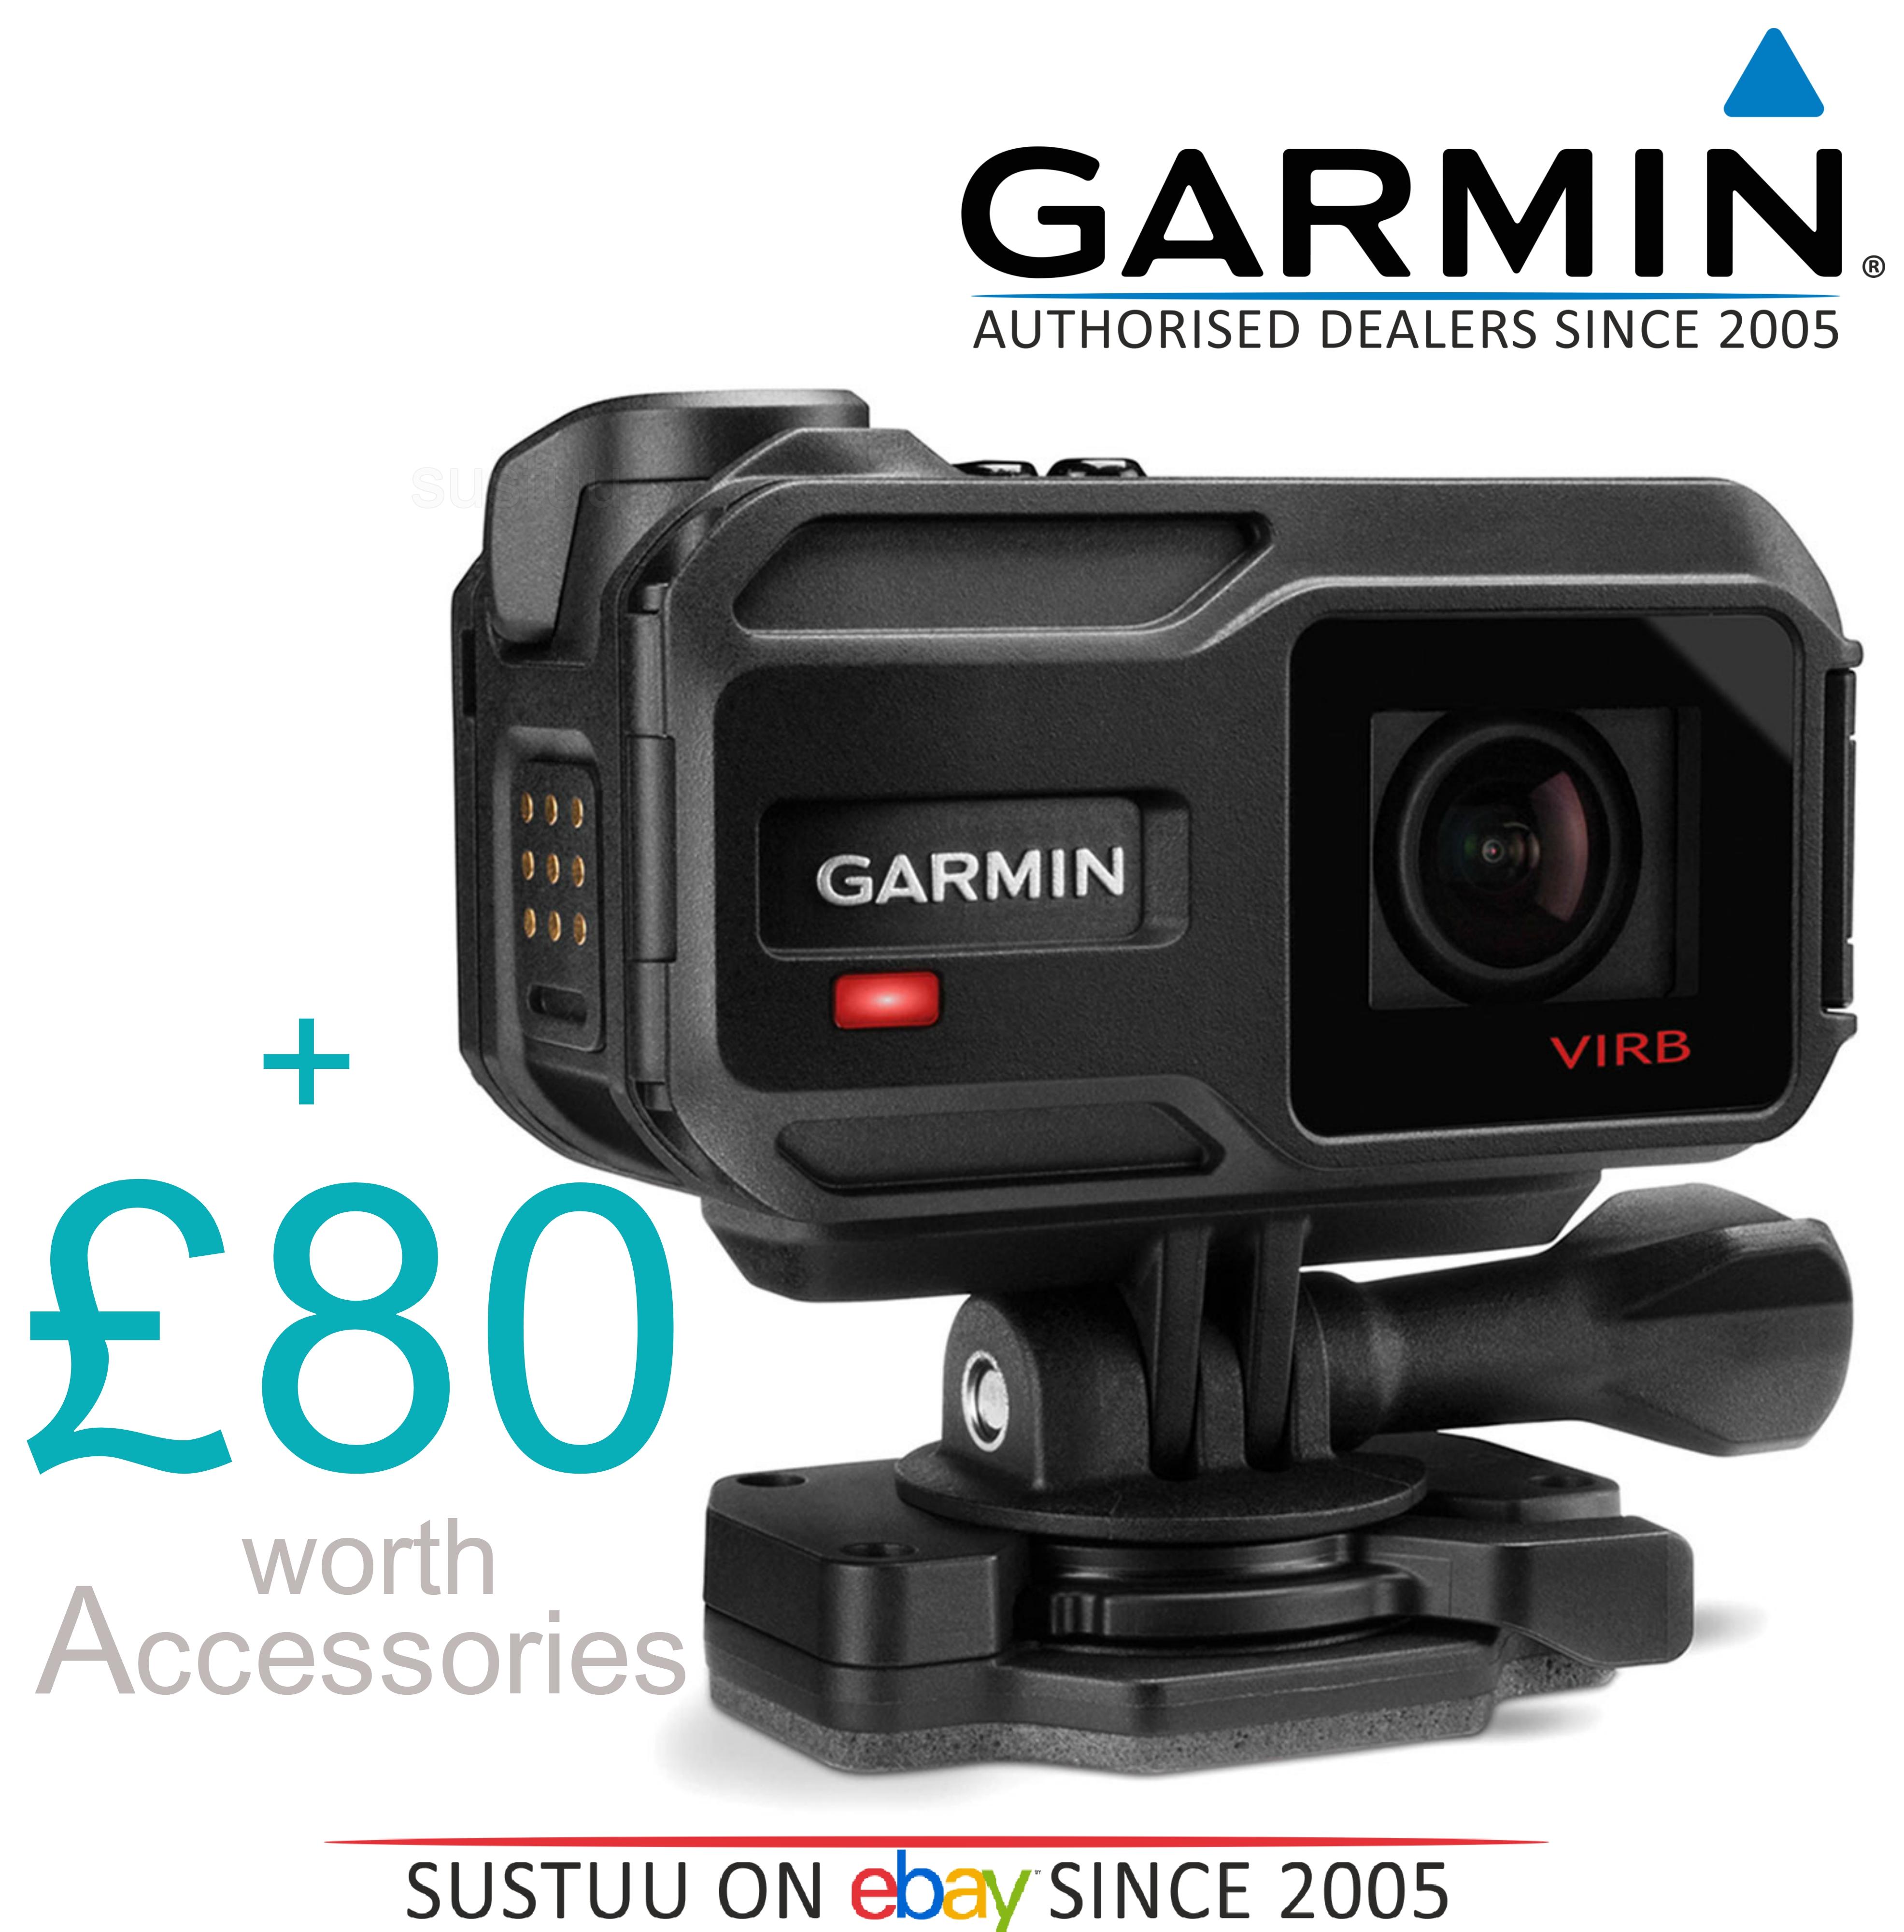 garmin virb xe full hd 1080p gps ant outdoor sports waterproof action camera sustuu. Black Bedroom Furniture Sets. Home Design Ideas